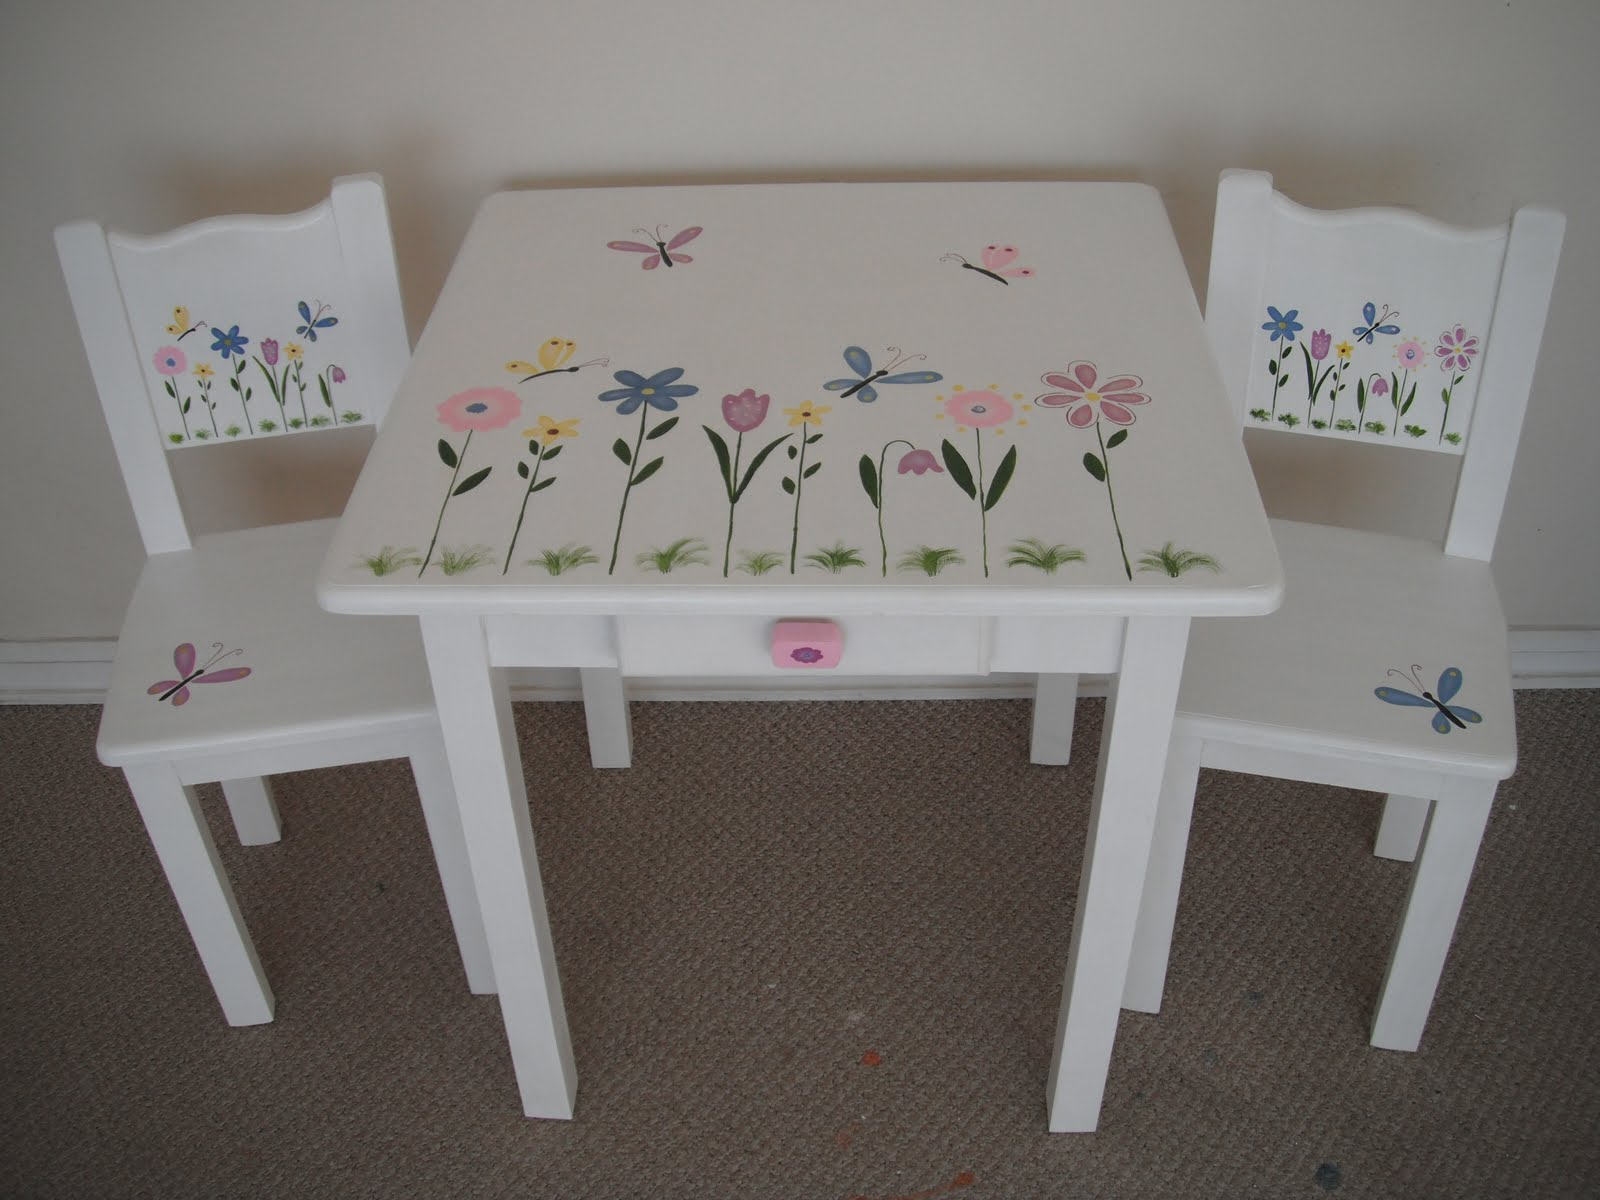 Muebles infantiles decoraci n para ni os juguetes - Mesita con sillas infantiles ...